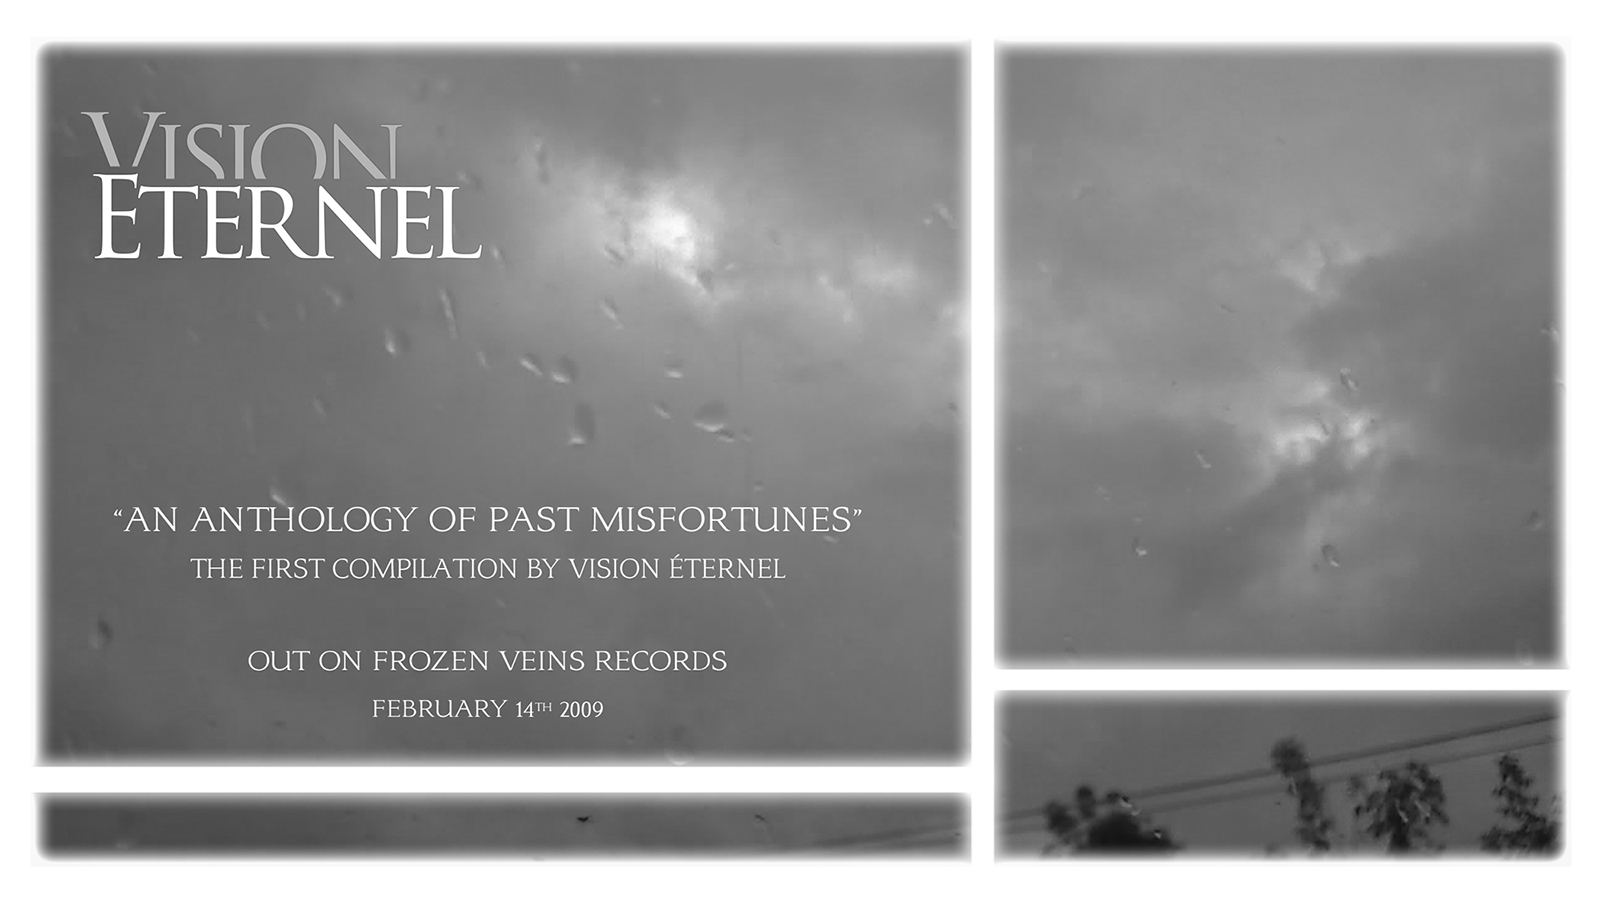 Vision Éternel An Anthology Of Past Misfortunes Compilation Is Released